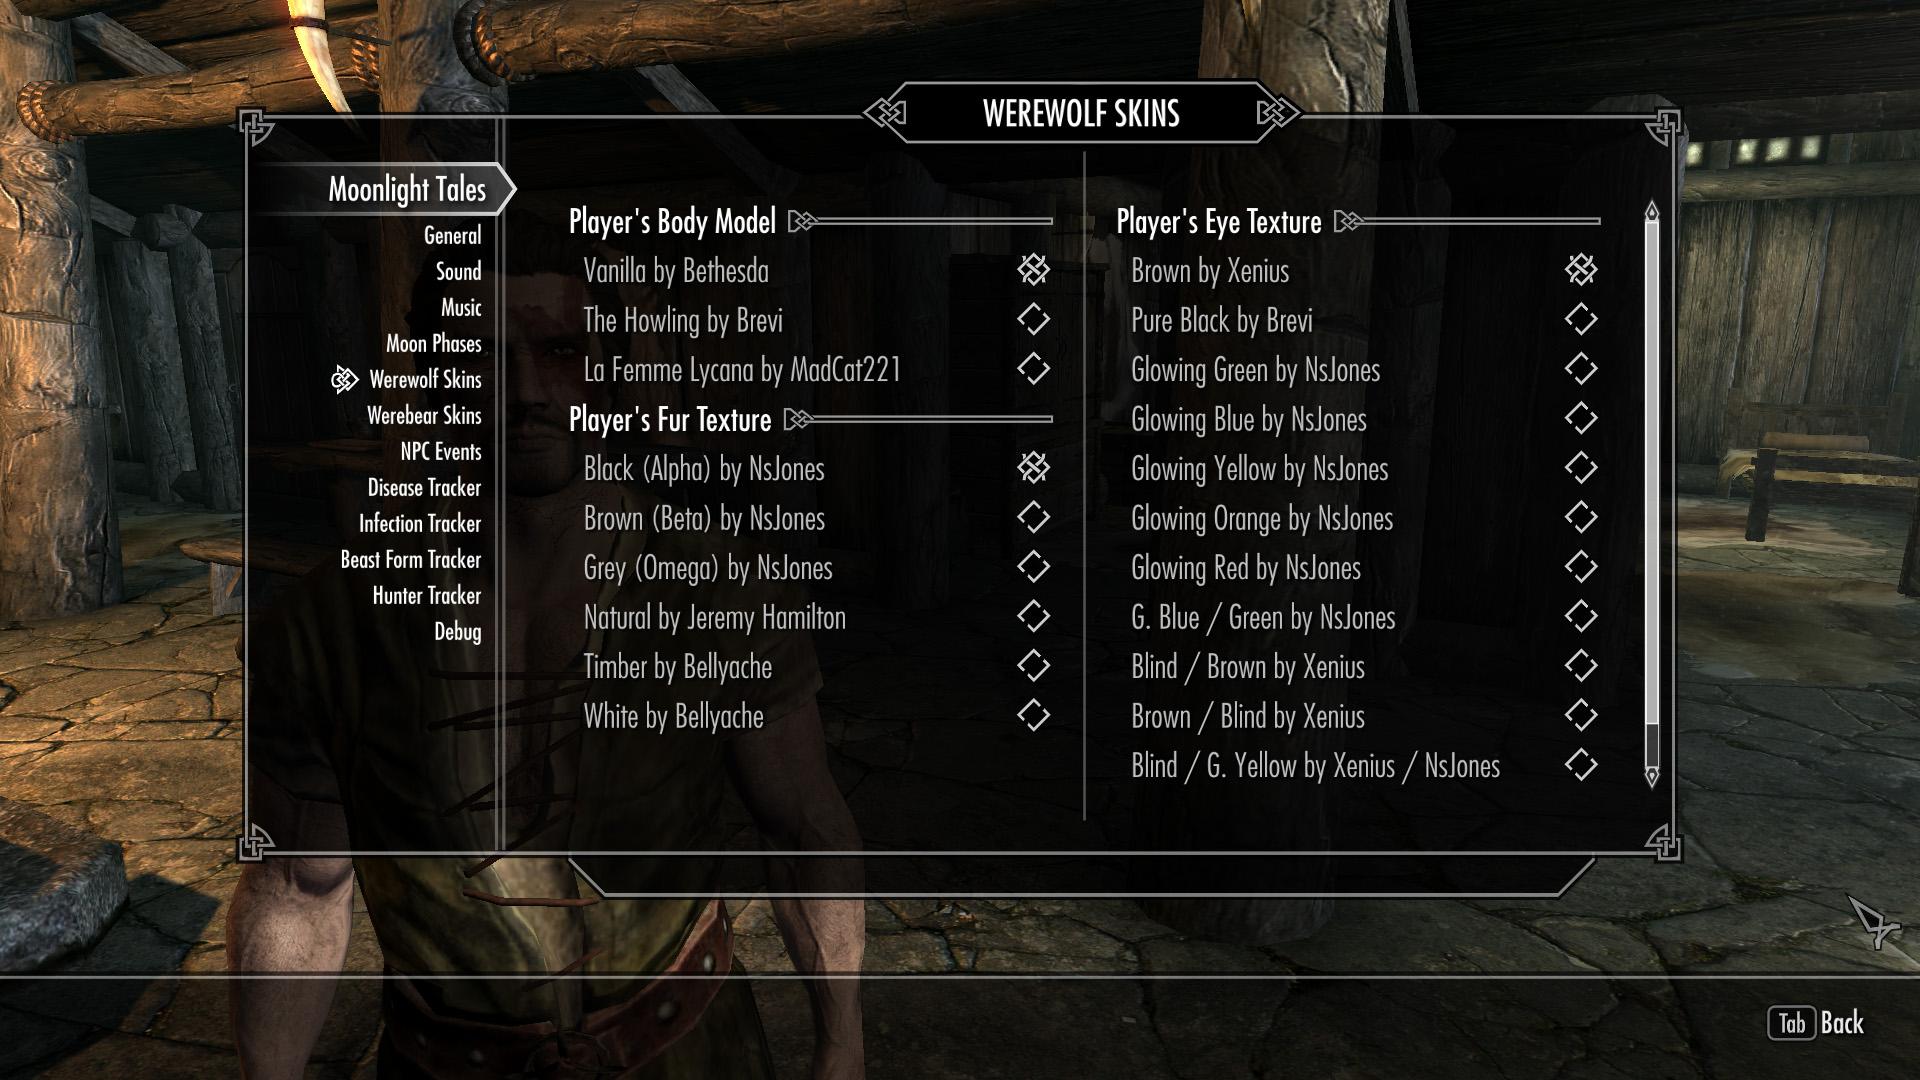 Moonlight Tales - Elder Scrolls Skyrim Mods Images